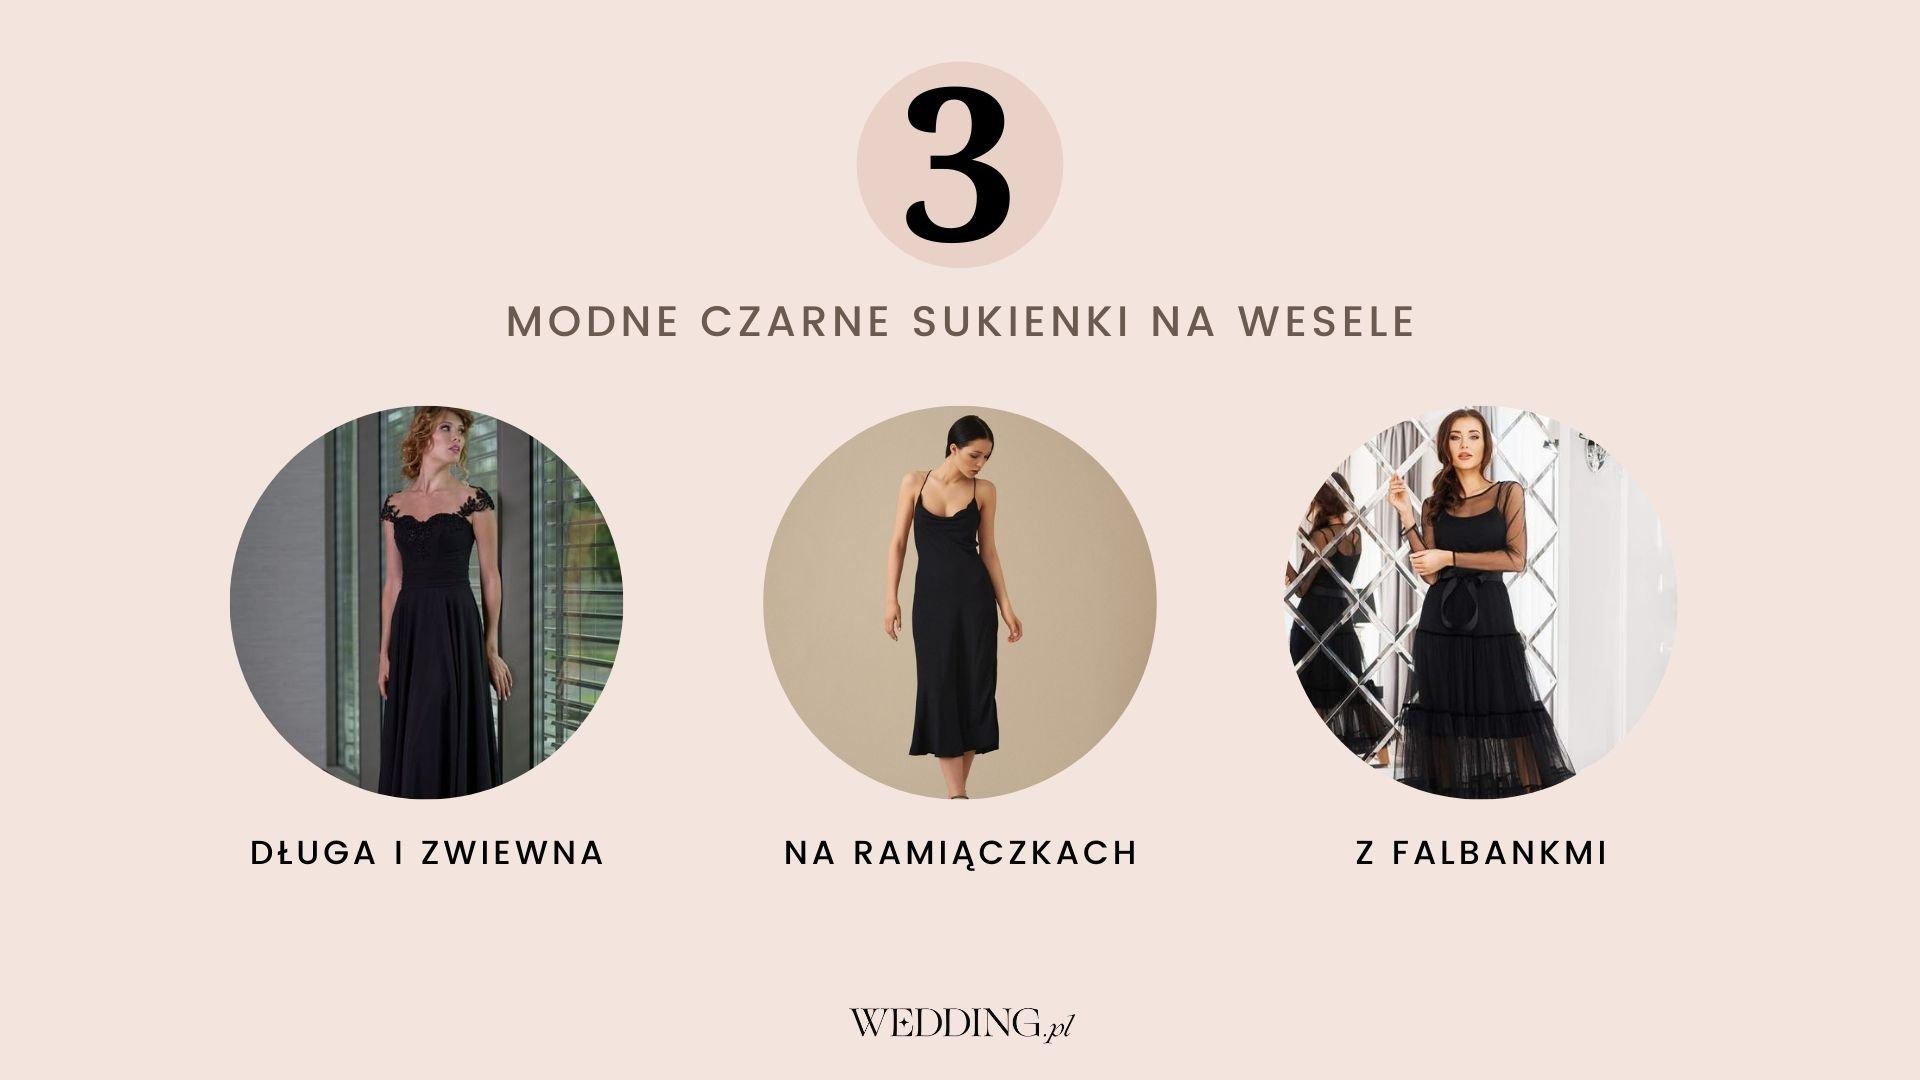 modne czarne sukienki na wesele